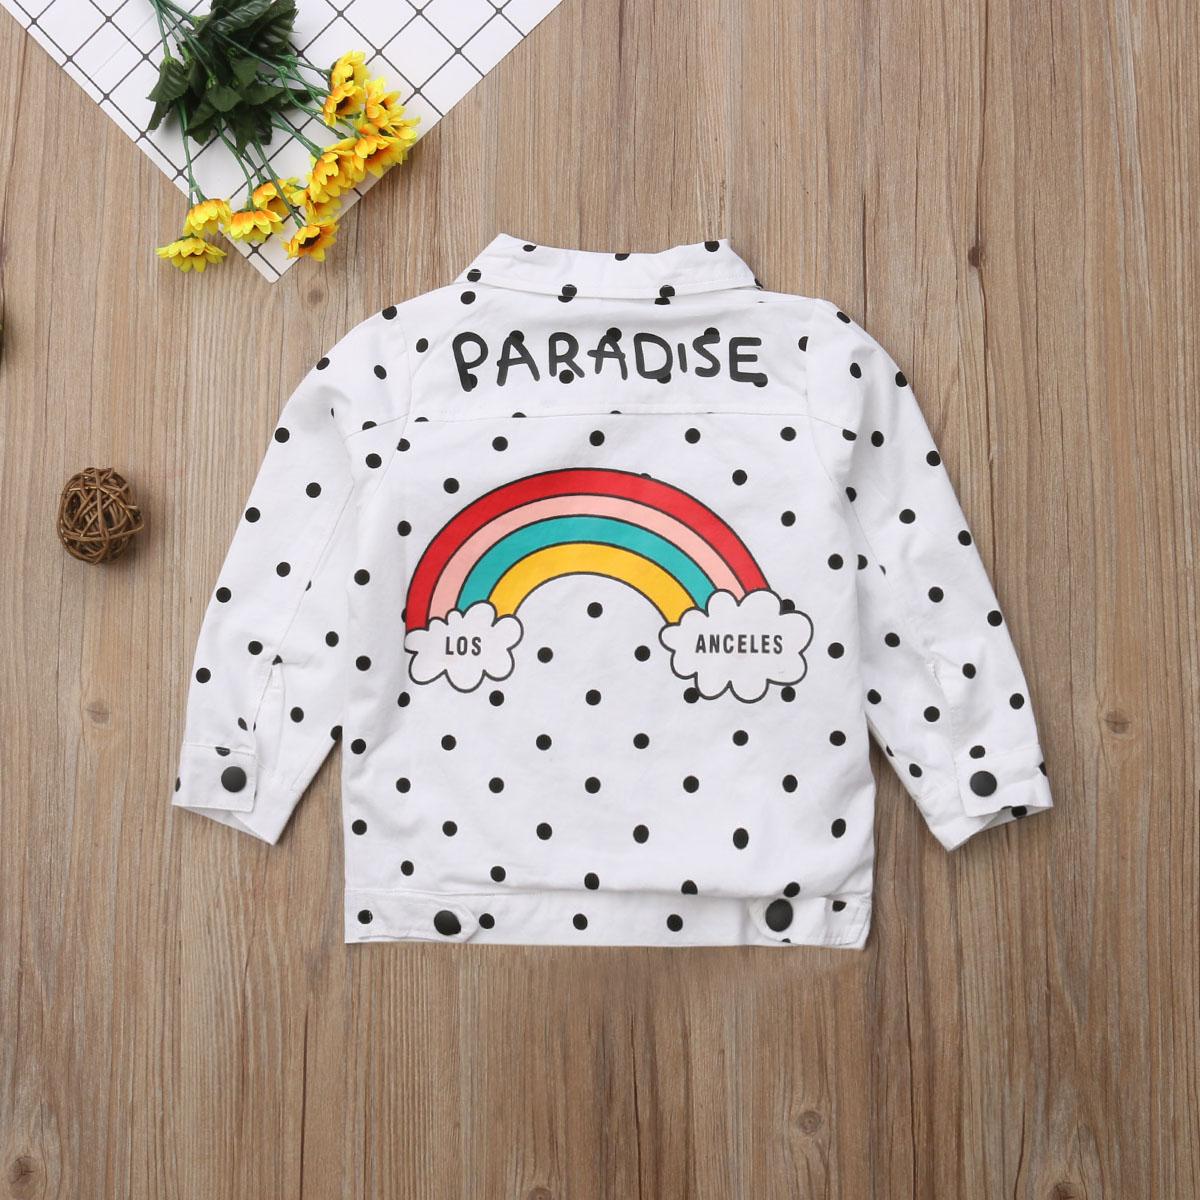 Toddler Kids Baby Girl Boy Long Sleeve Tassel Rainbow Sweatshirt Casual Shirt Pullover Tops